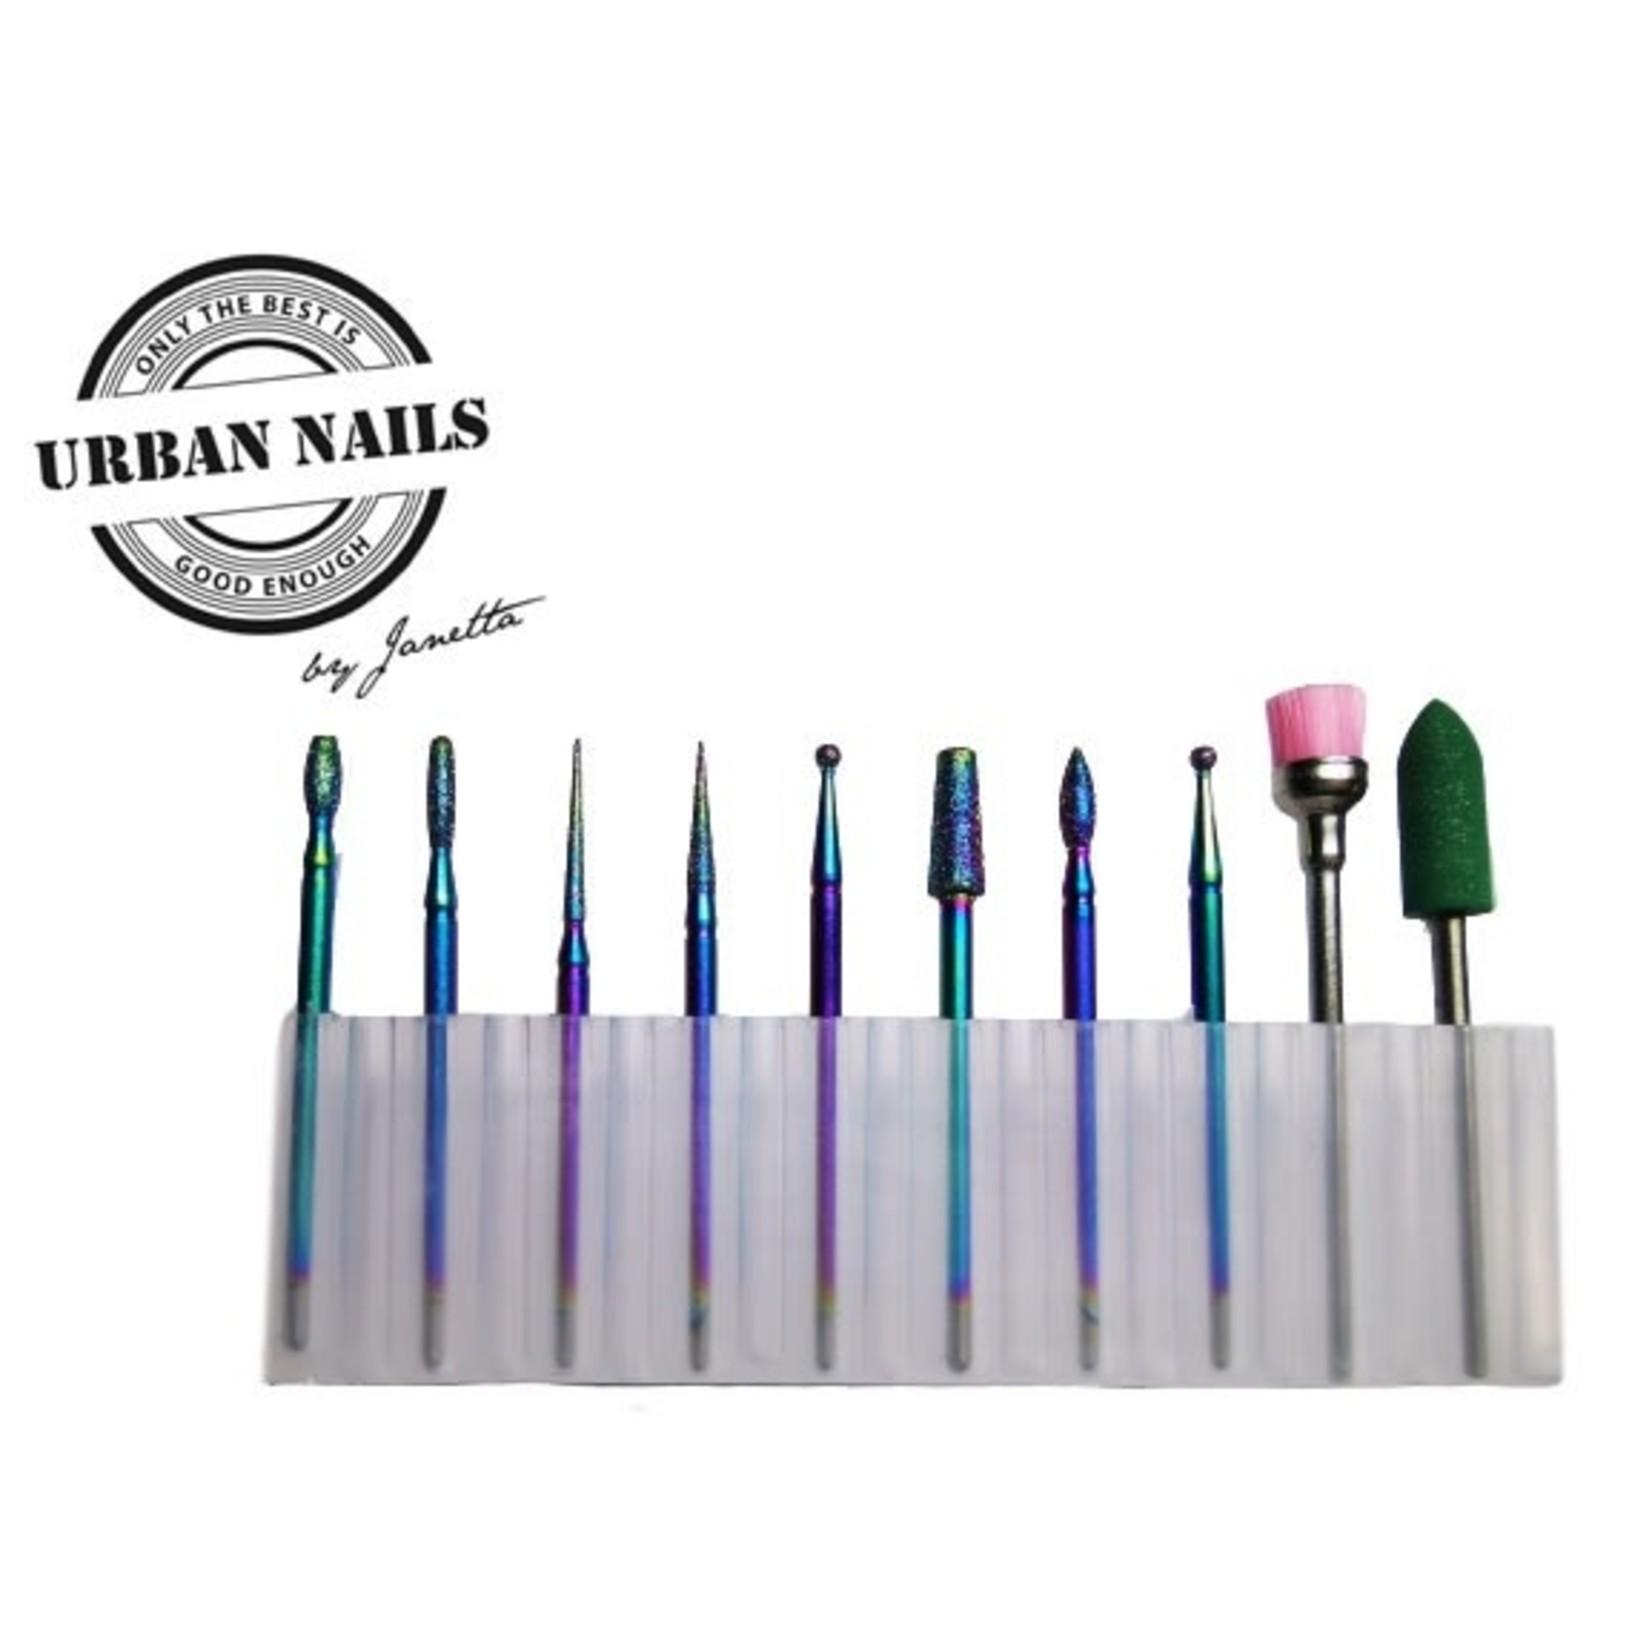 Urban Nails Manicure setje voor freesbitjes